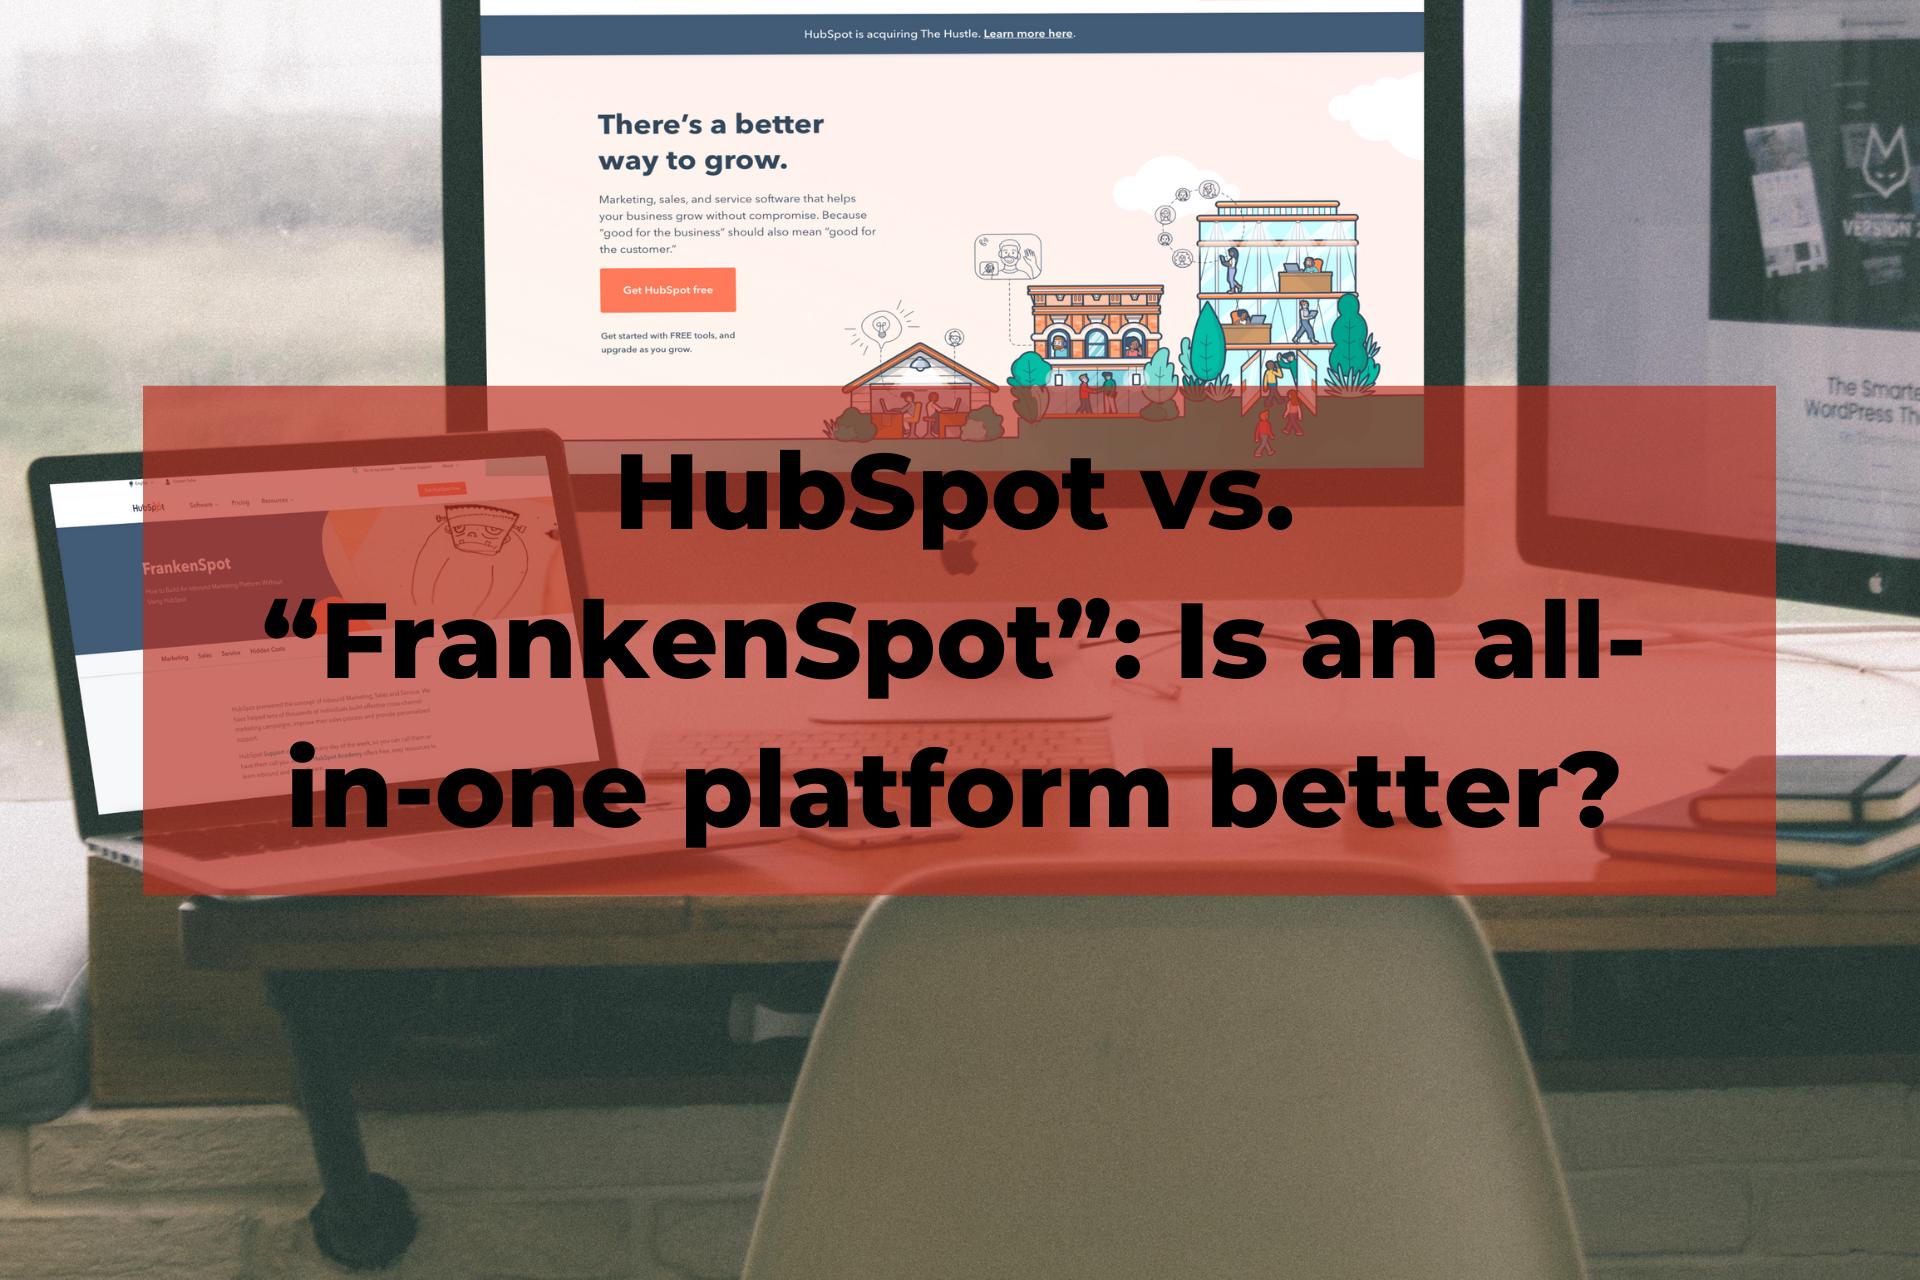 HubSpot vs FrankenSpot